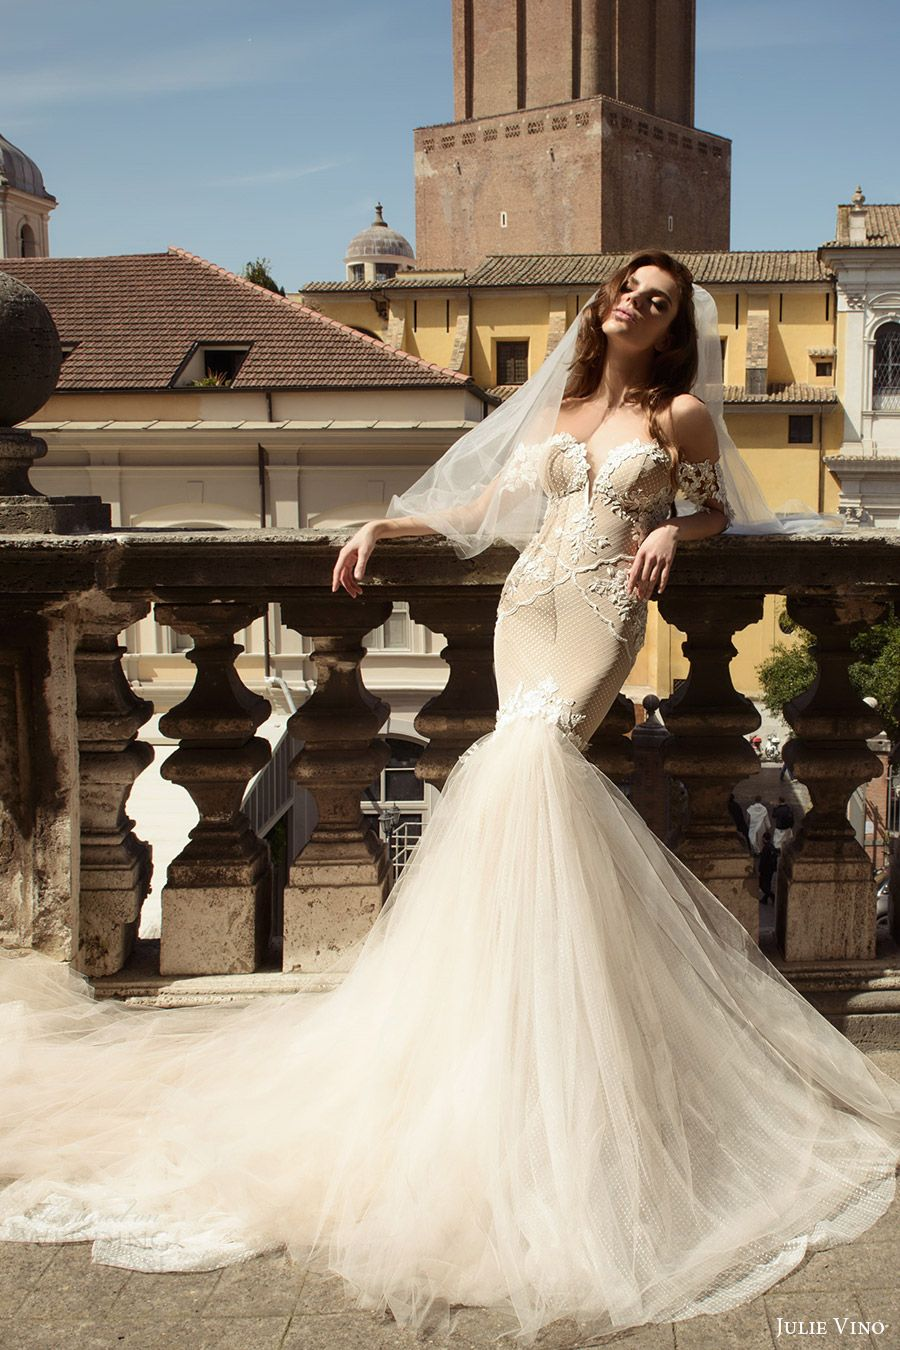 Julie vino bridal spring wedding dresses u roma bridal